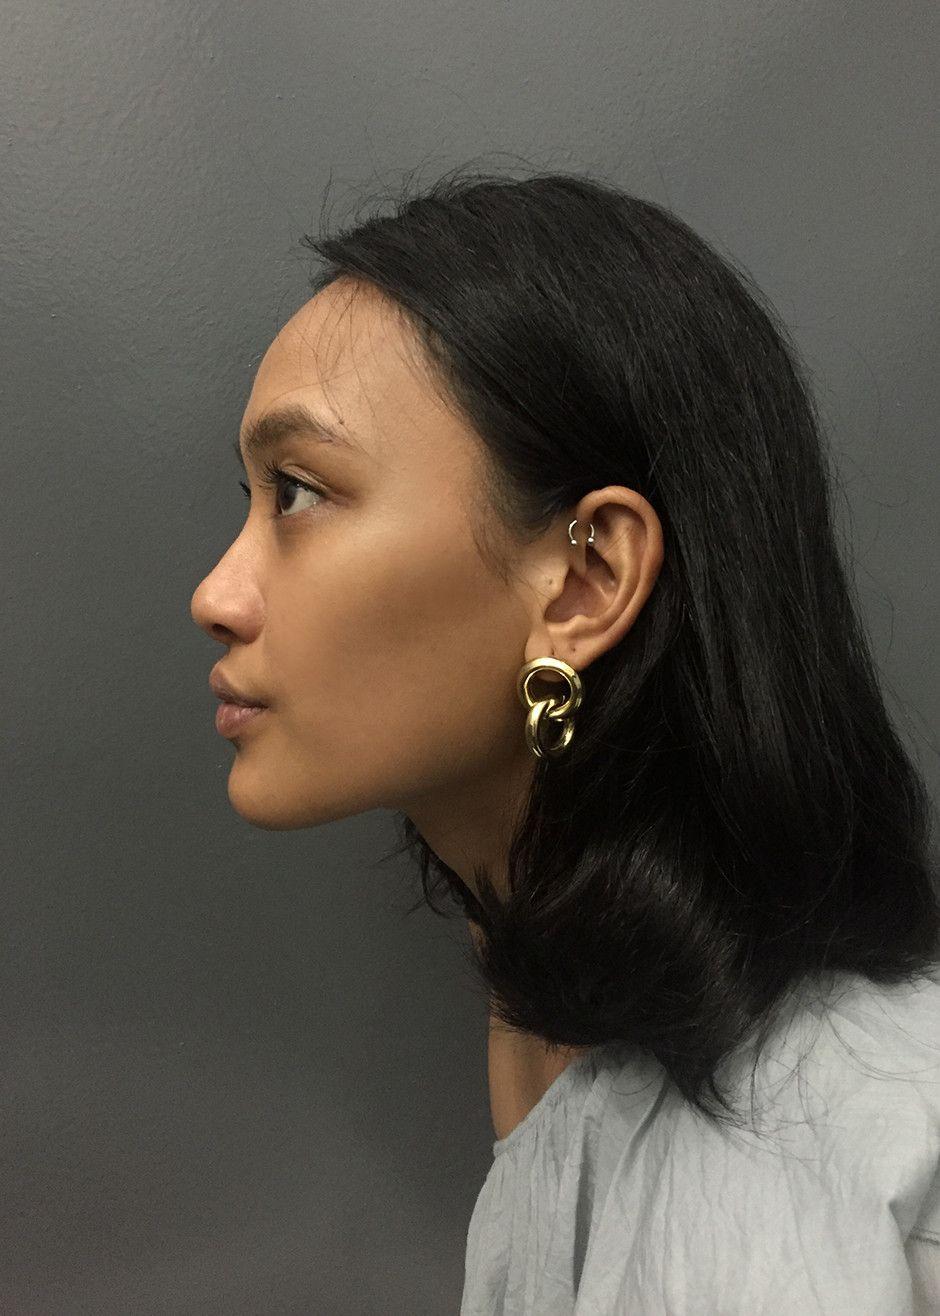 c9134b9c3 Interlocking, Hollow Hoop Earrings Vintage/Recycled Brass, 14k Gold Post  for Pierced Ears 1.5